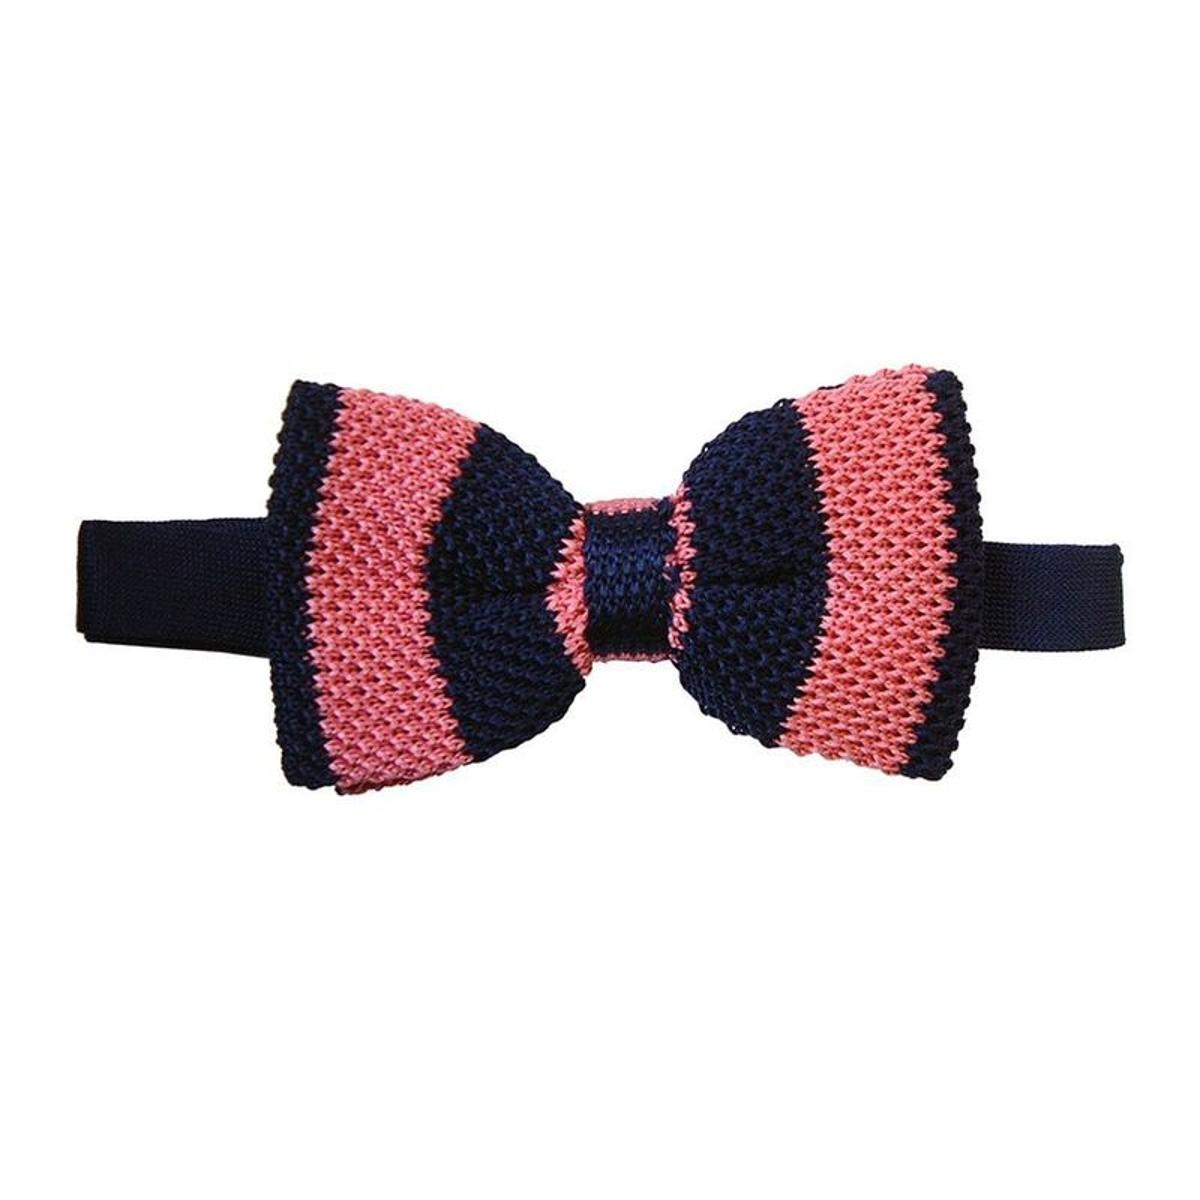 Noeud papillon tricot Gentleman club. Soie Club / rayé